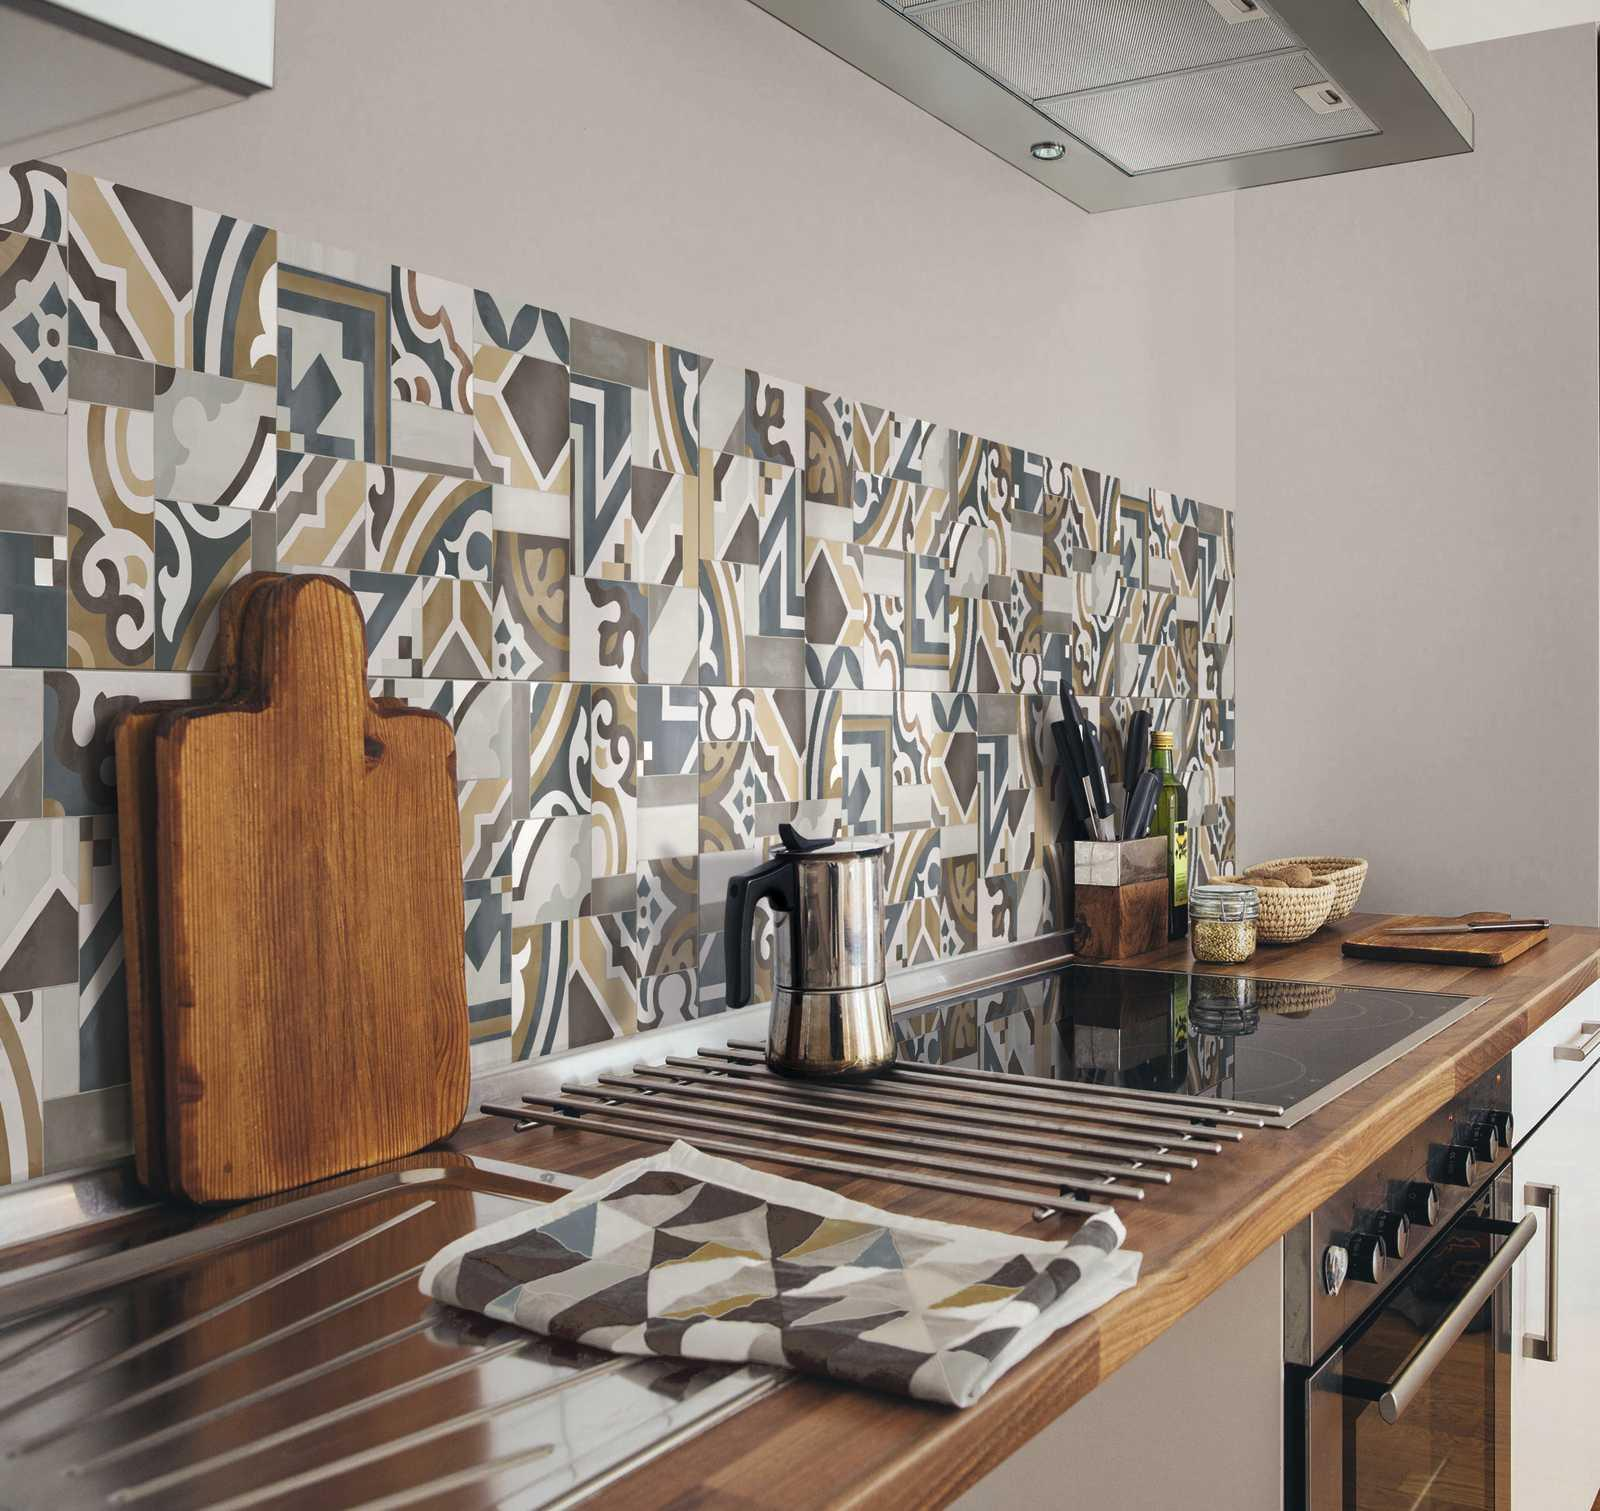 Gres Porcellanato Piastrelle Cucina kitchen flooring: versatility and elegance | ragno